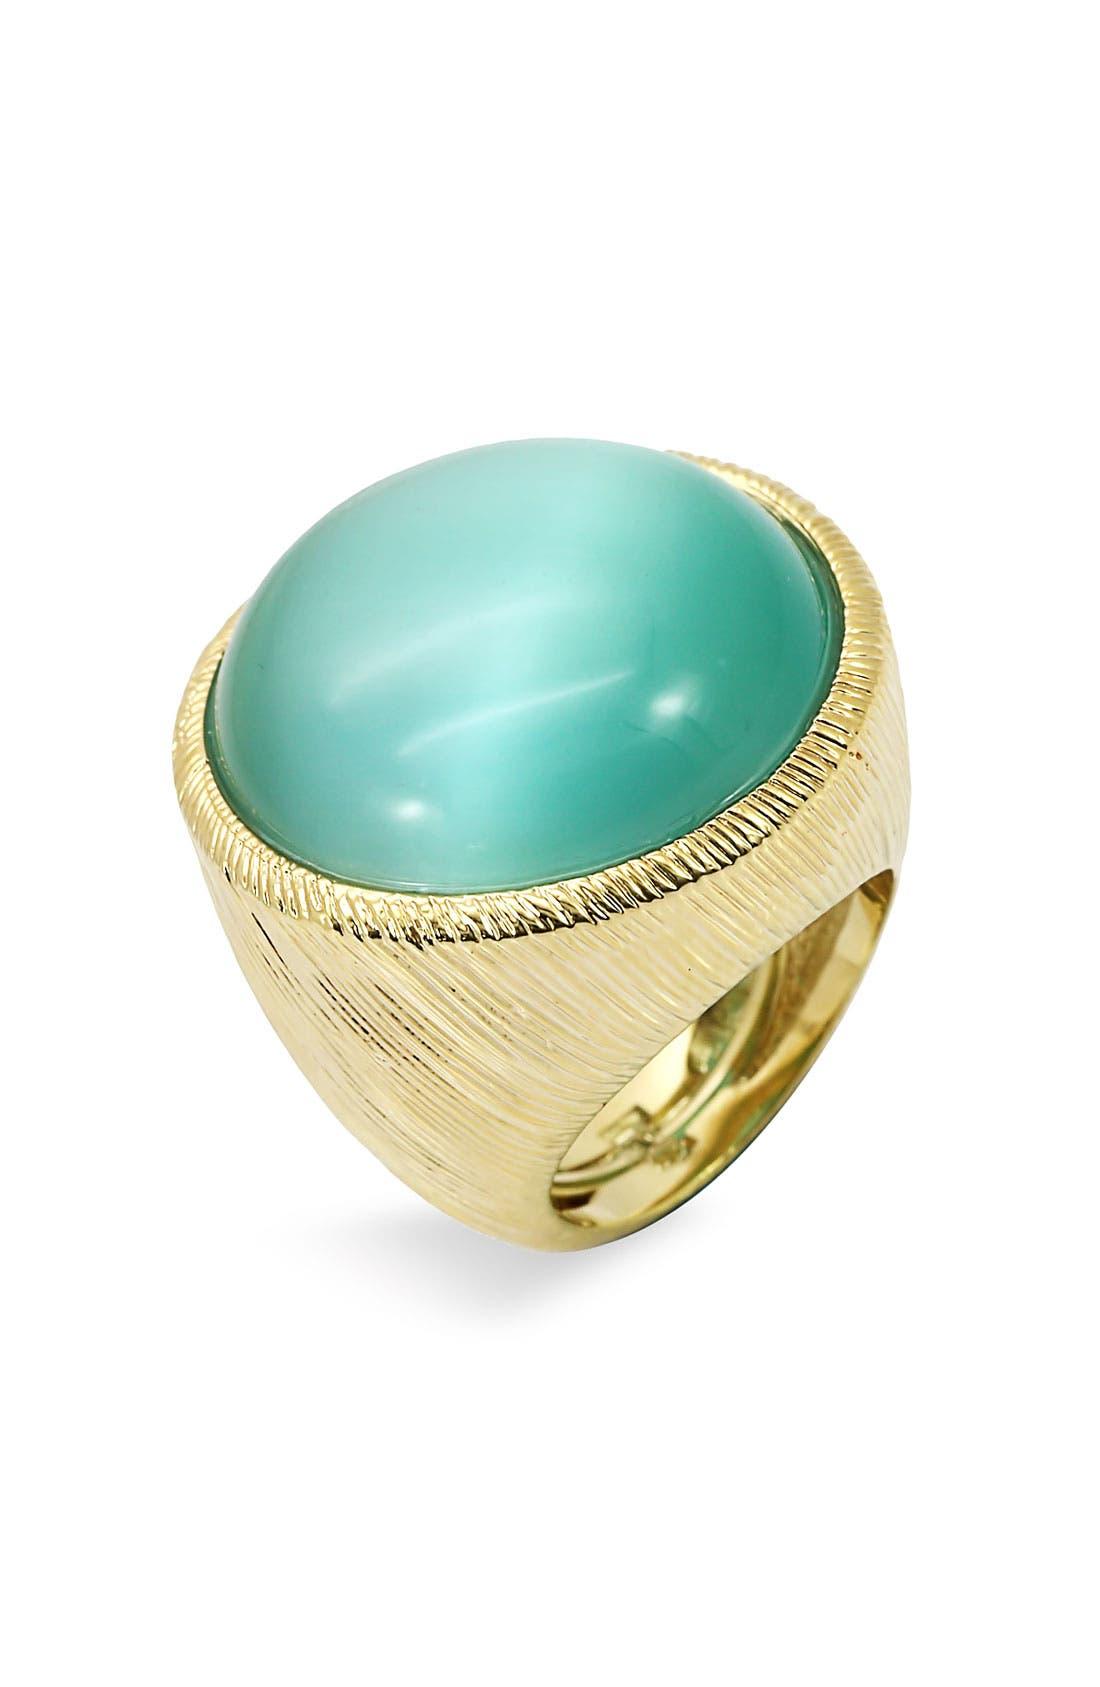 Main Image - Ariella Collection Round Cabochon Ring